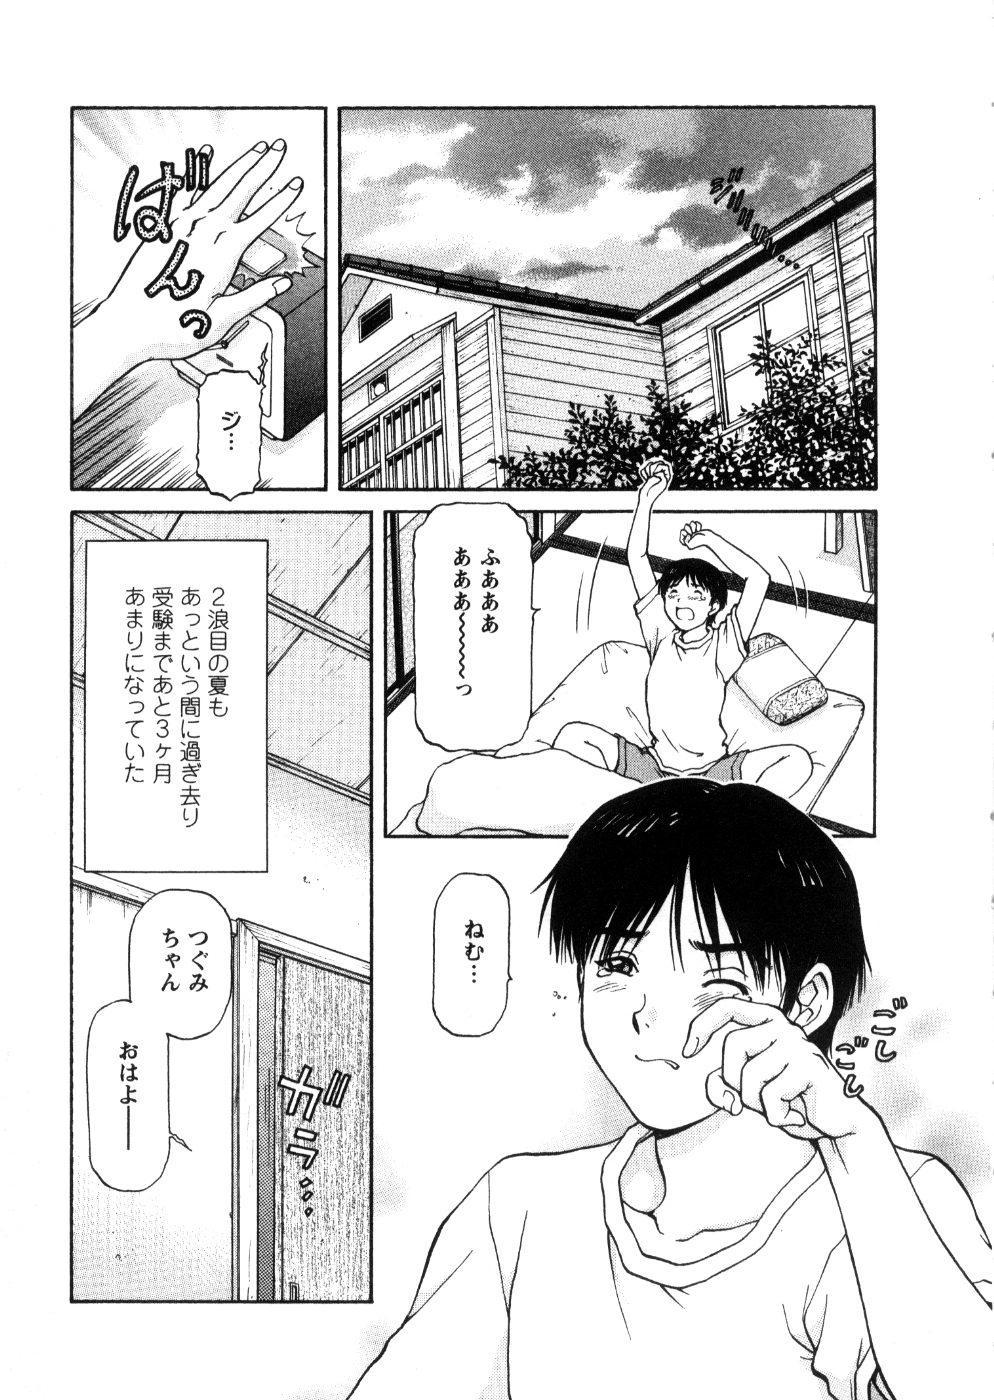 Oneechan-tachi ga Yatte Kuru 03 70